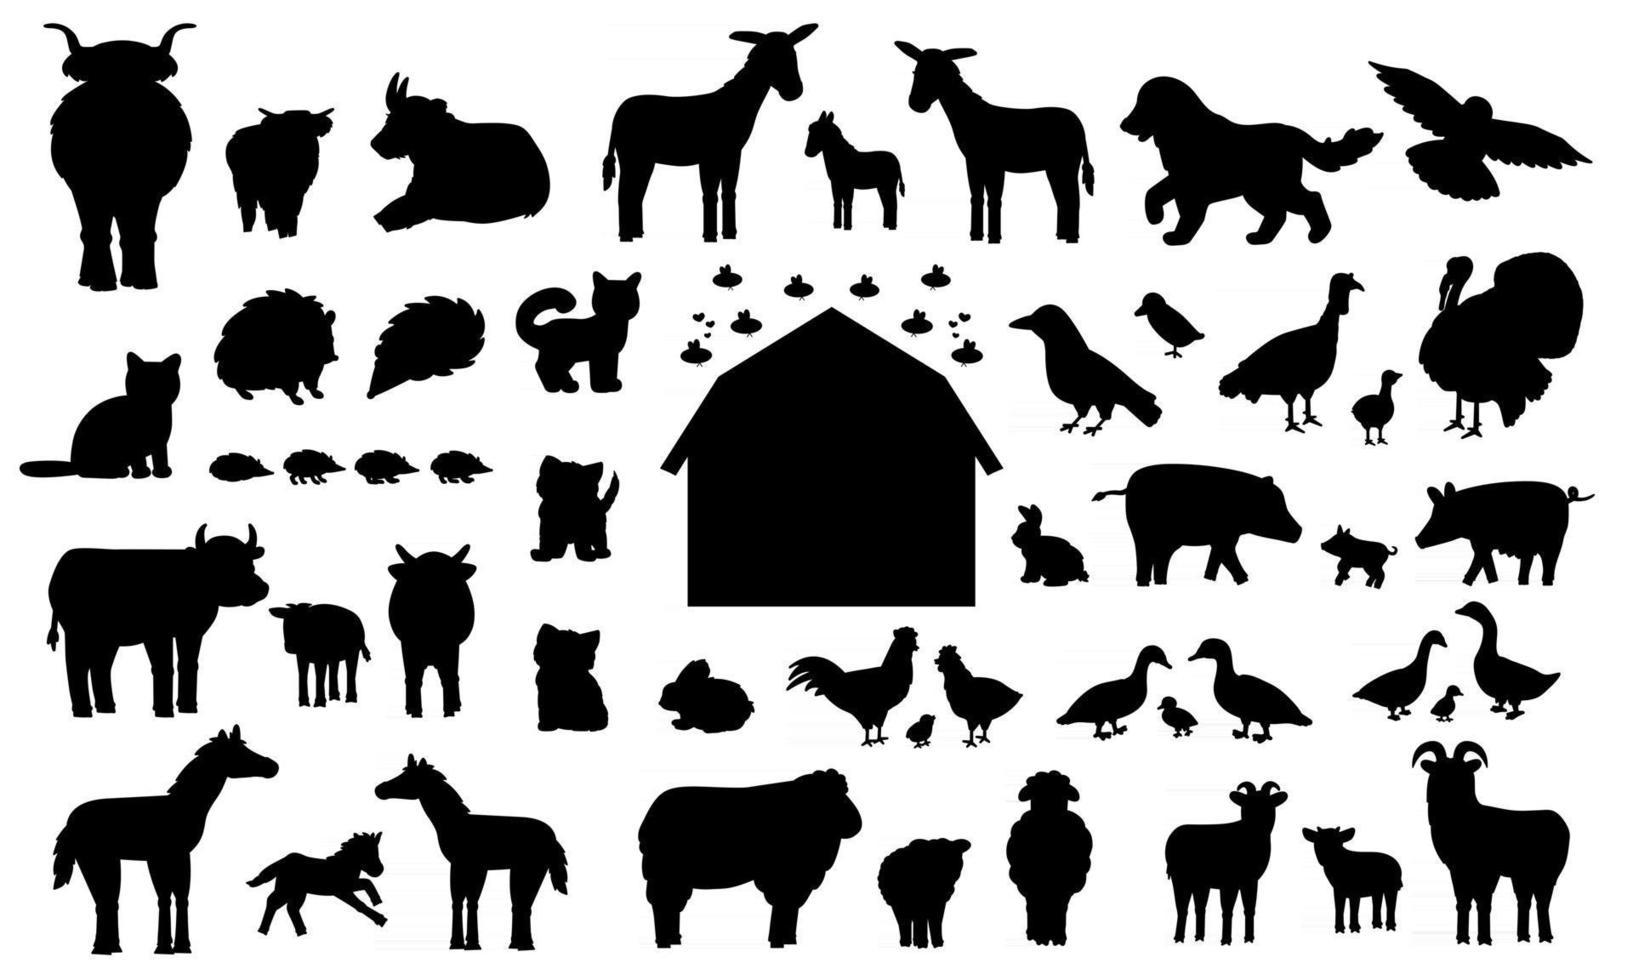 Set of silhouette cartoon farm animals. Vector collection of wooden barn, donkey goose cow bull pig hog chicken hen rooster goat sheep duck horse turkey cat dog hedgehog rabbit bunny birds